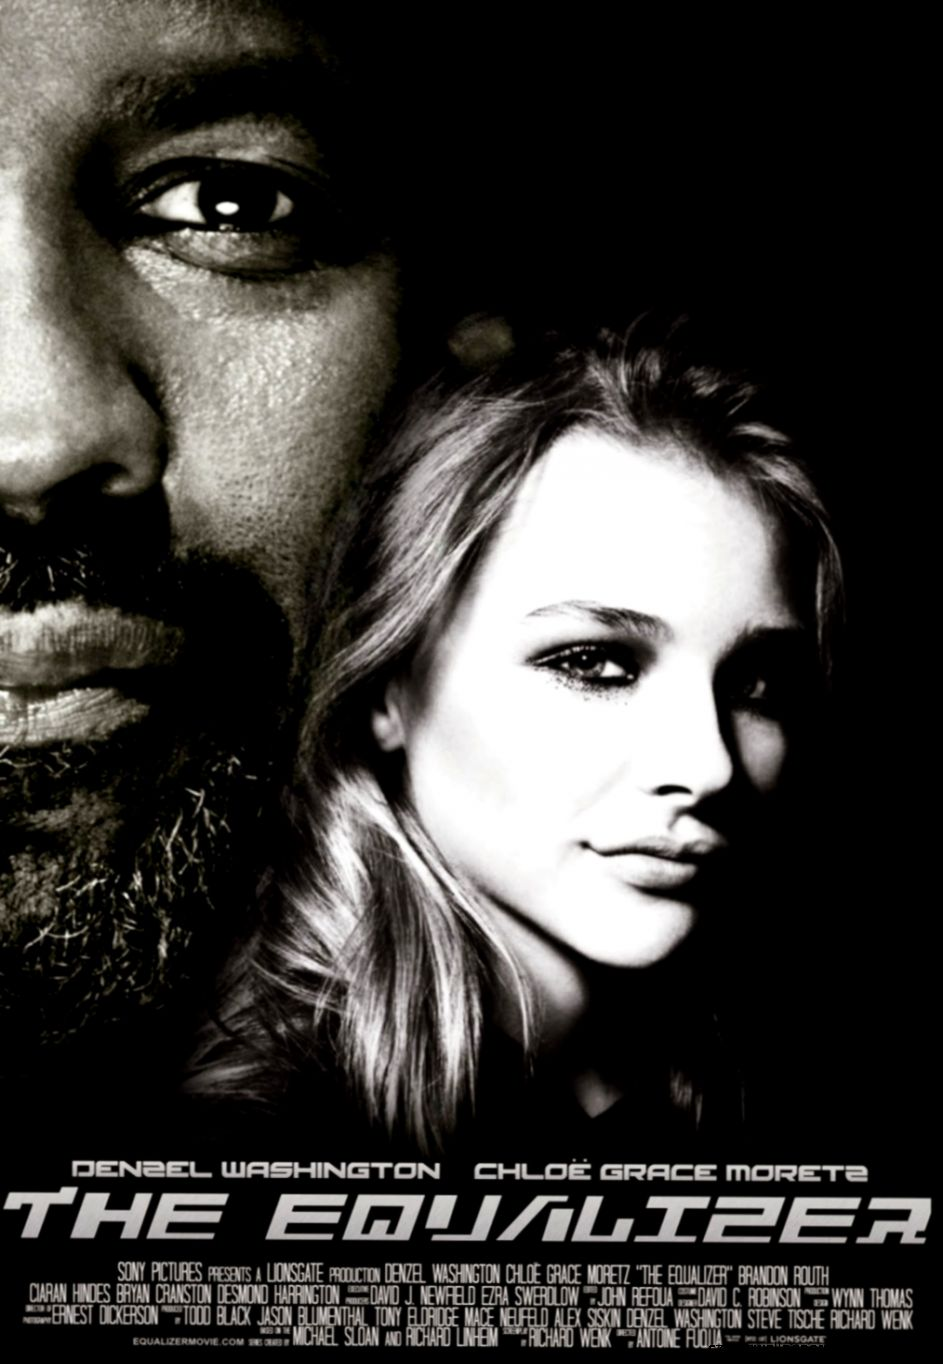 Movie Smack Talk Denzel Washingtons new movie The Equalizer   4